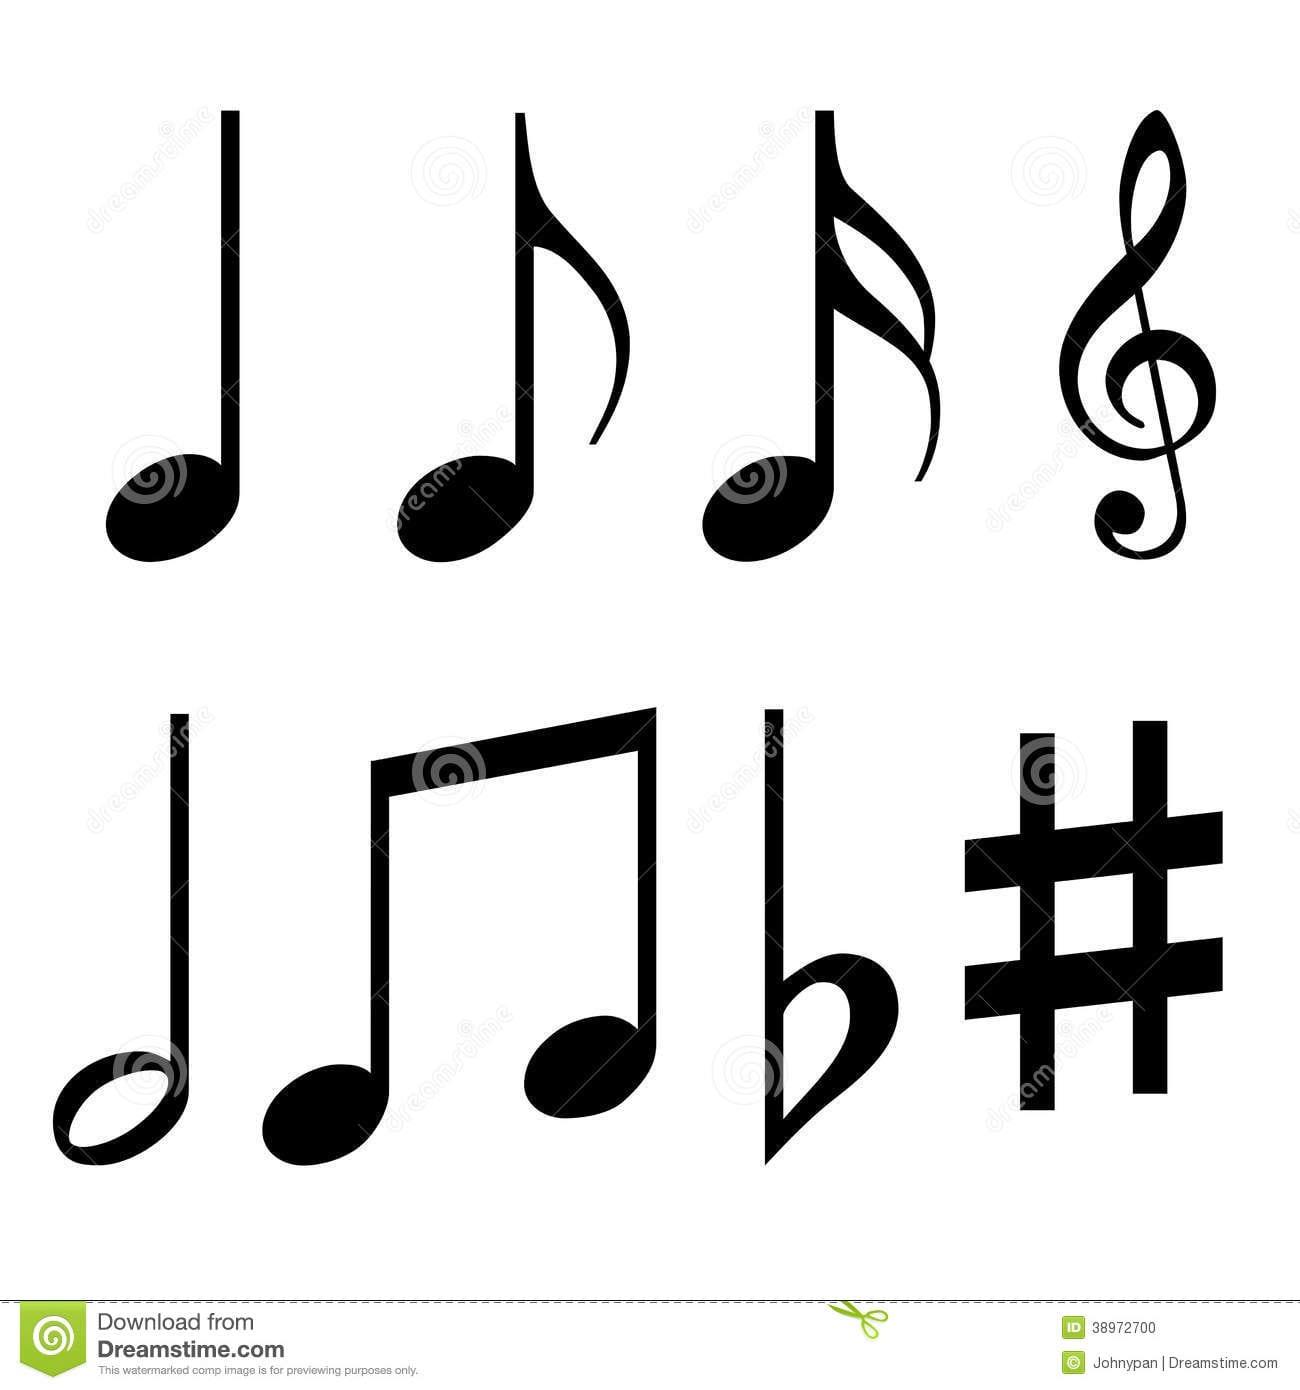 Terrific Printable Musical Notes Symbols Music 25426